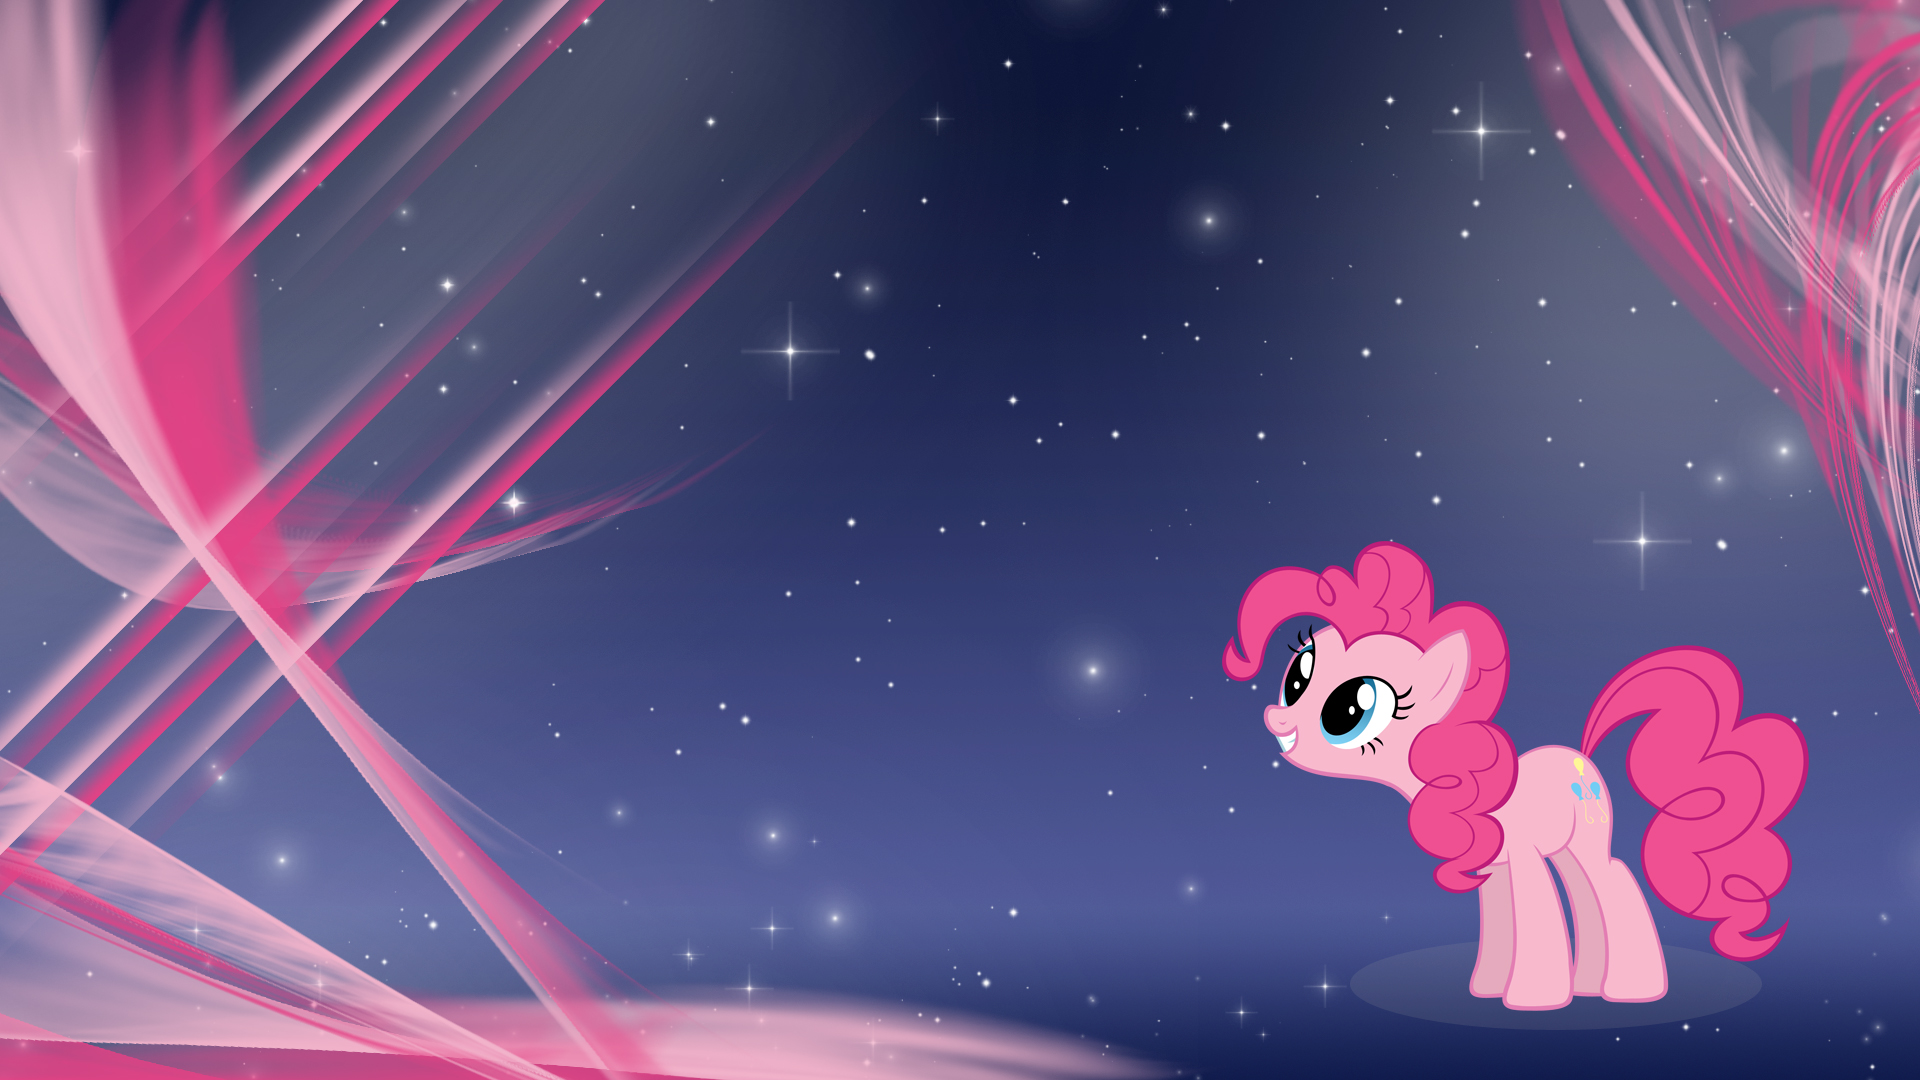 MLP: FiM - Pinkie Pie V2 by Unfiltered-N